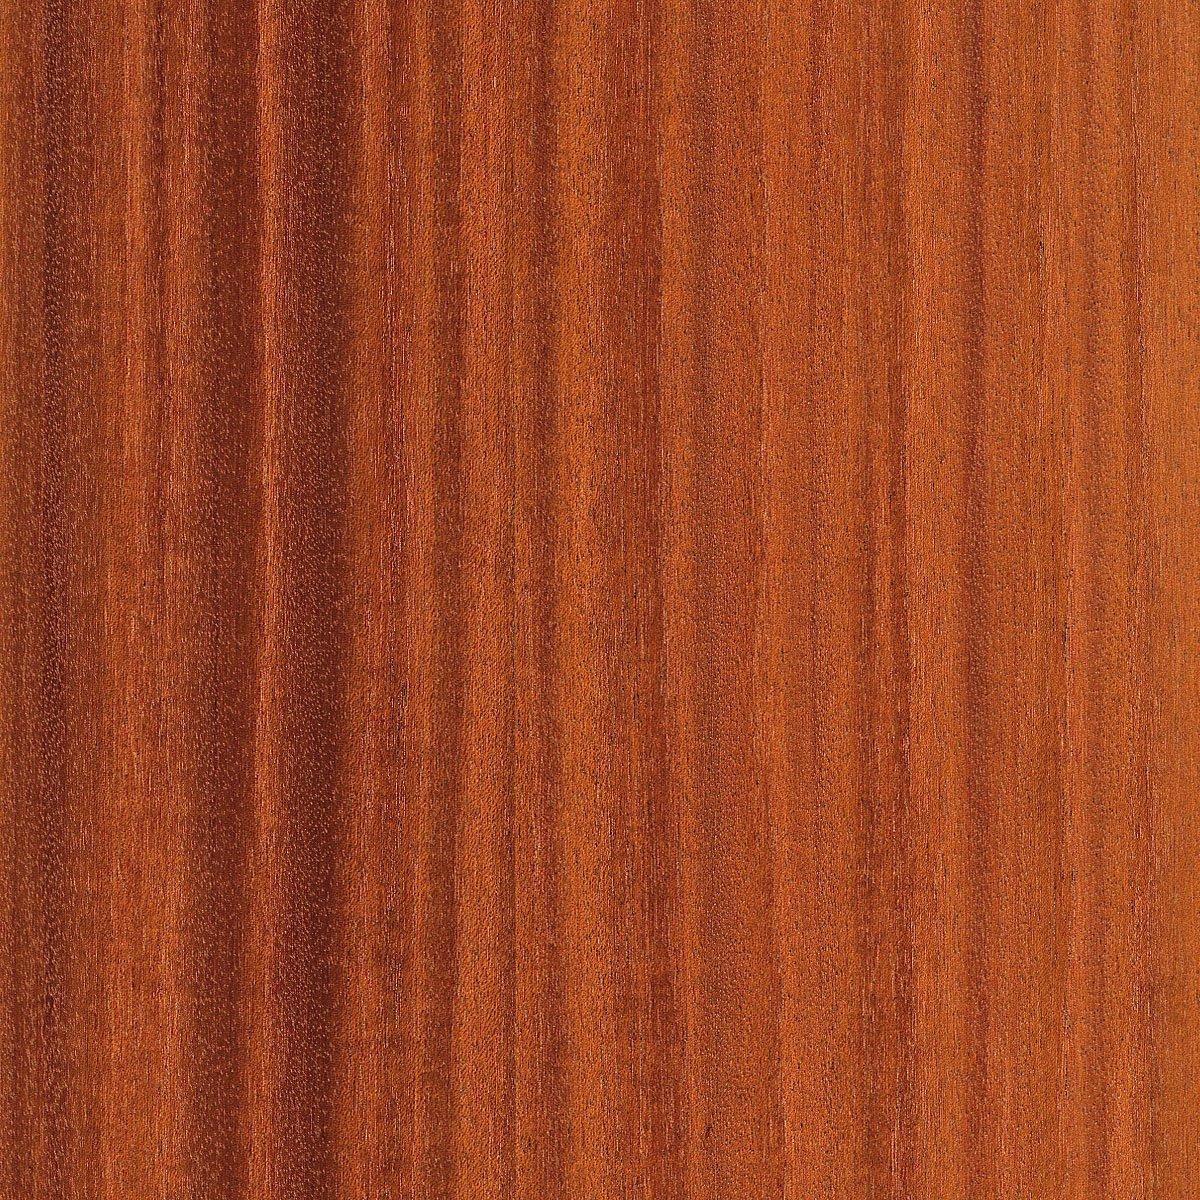 Mahogany Wood Veneer Qtr Ribbon 4'x8' 10 mil Sheet